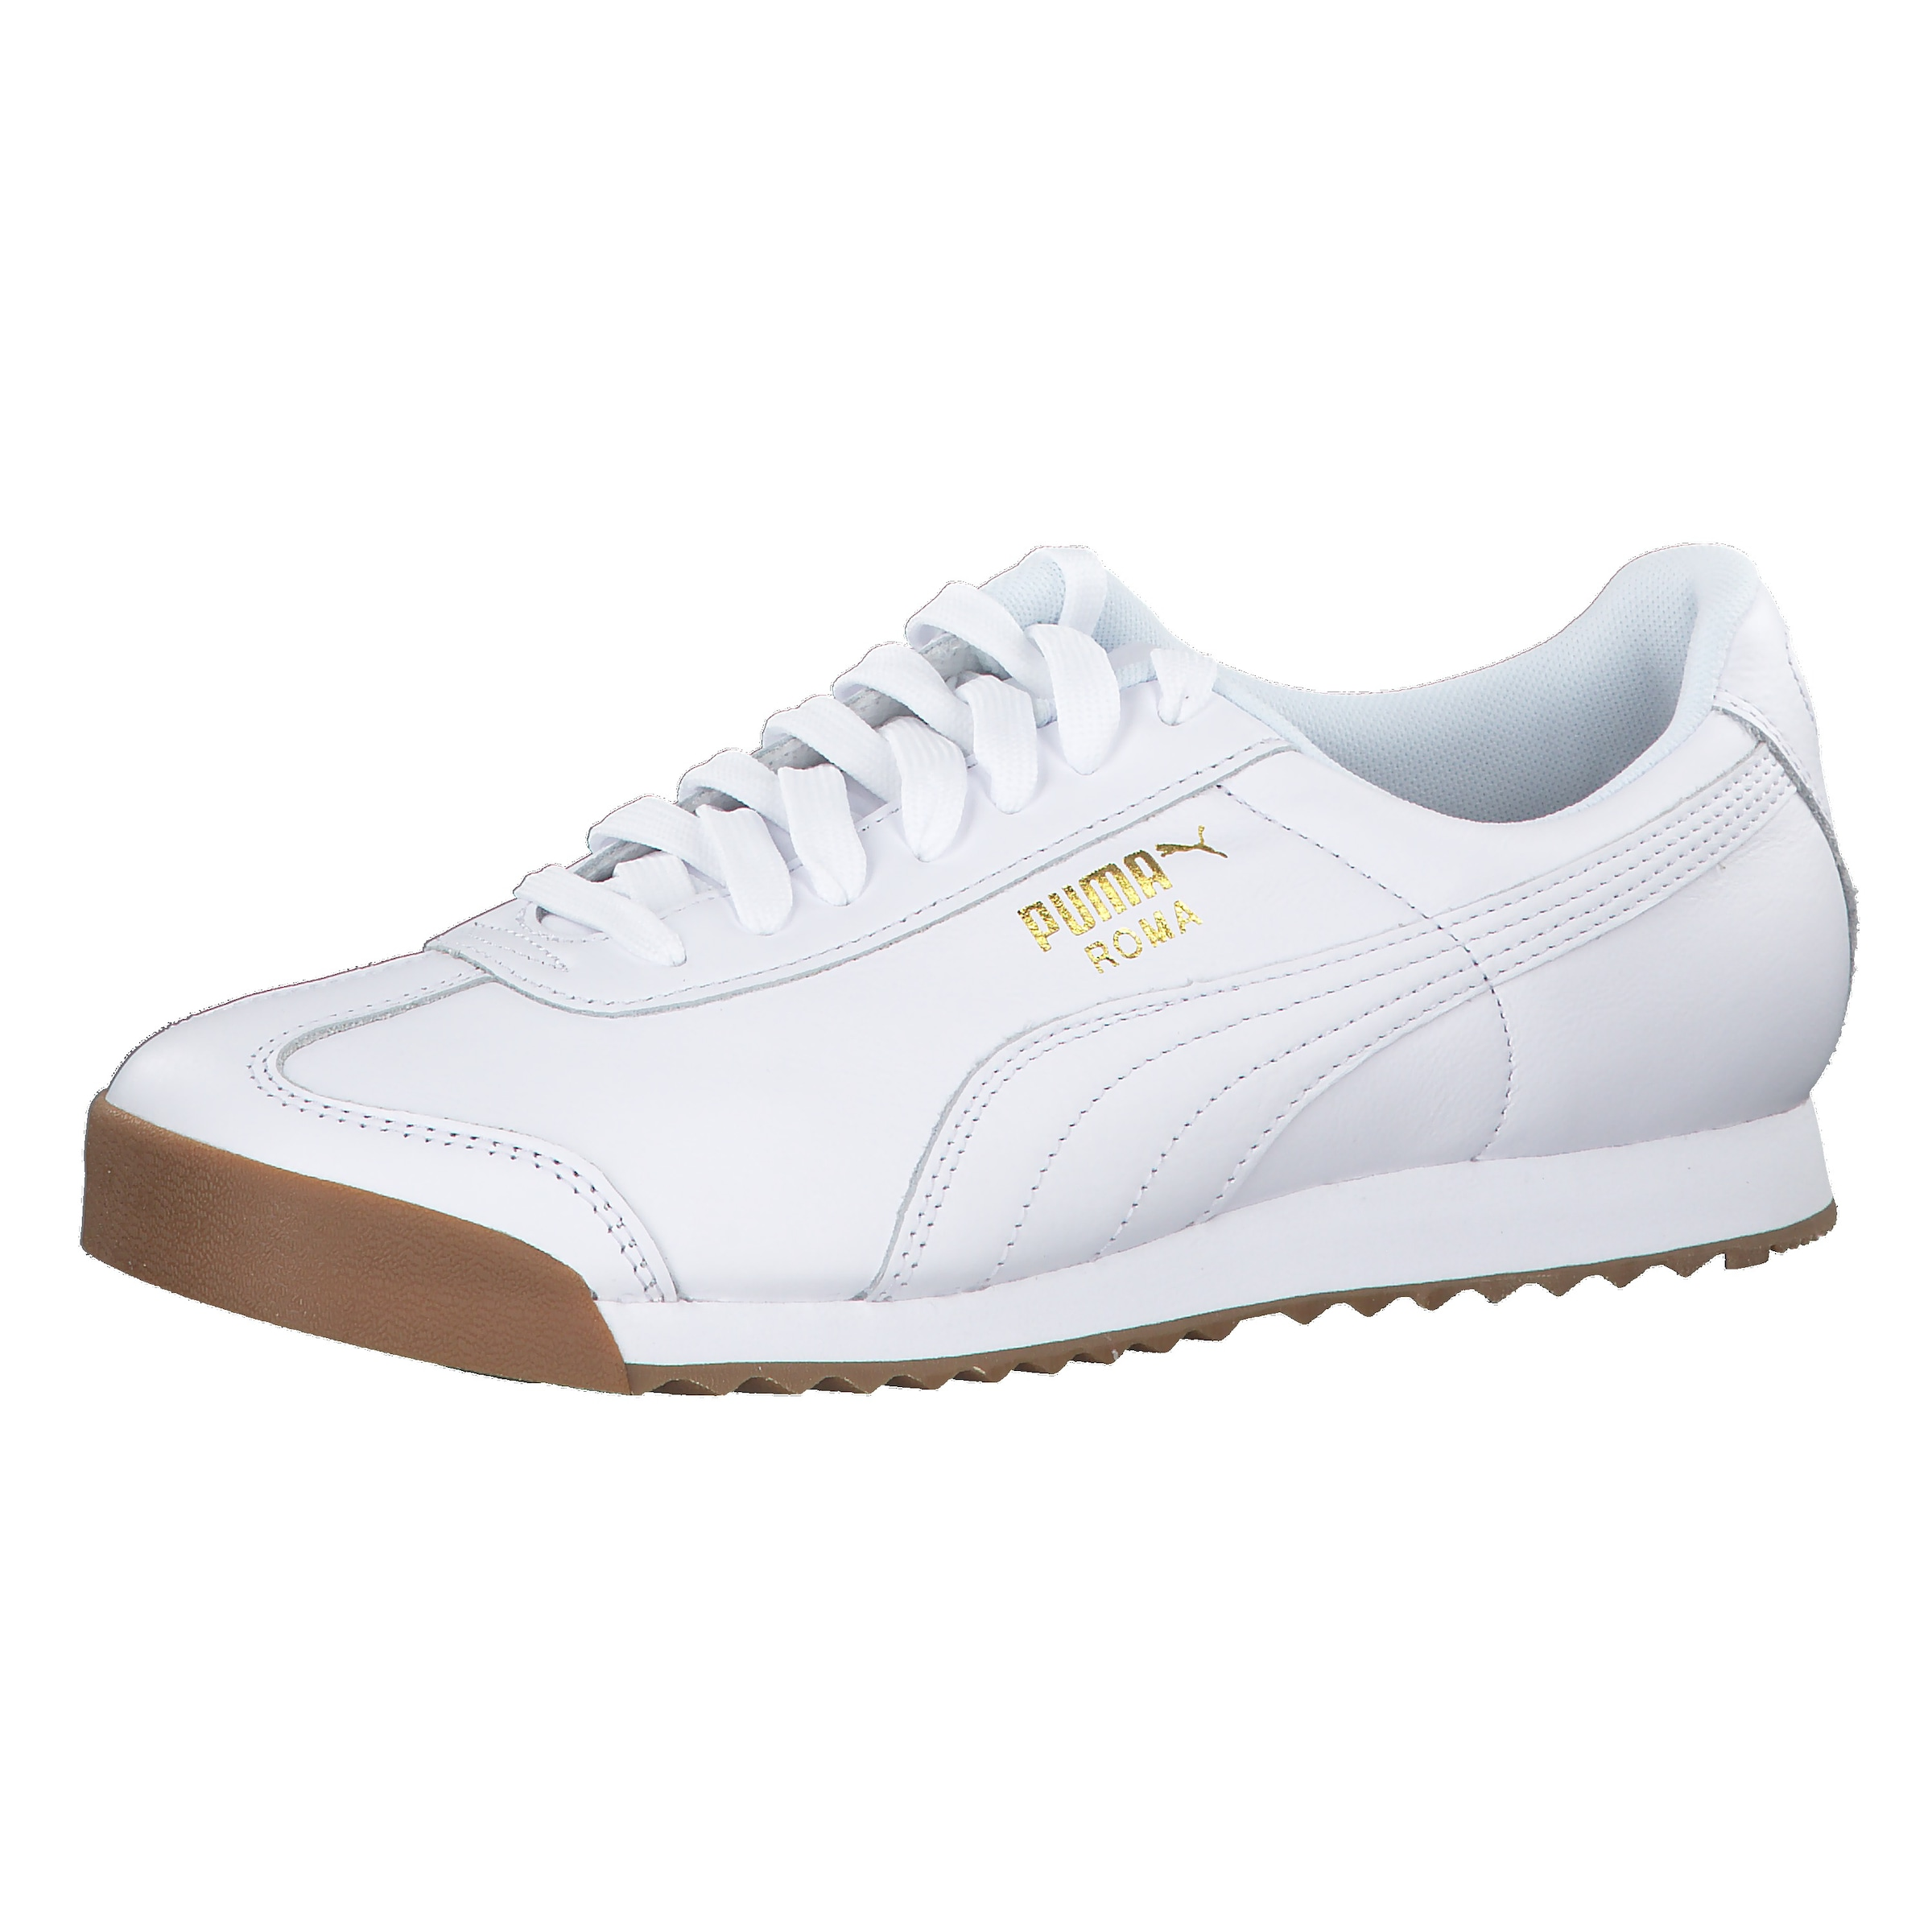 PUMA Sneaker Roma Classic Gum Hohe Qualität